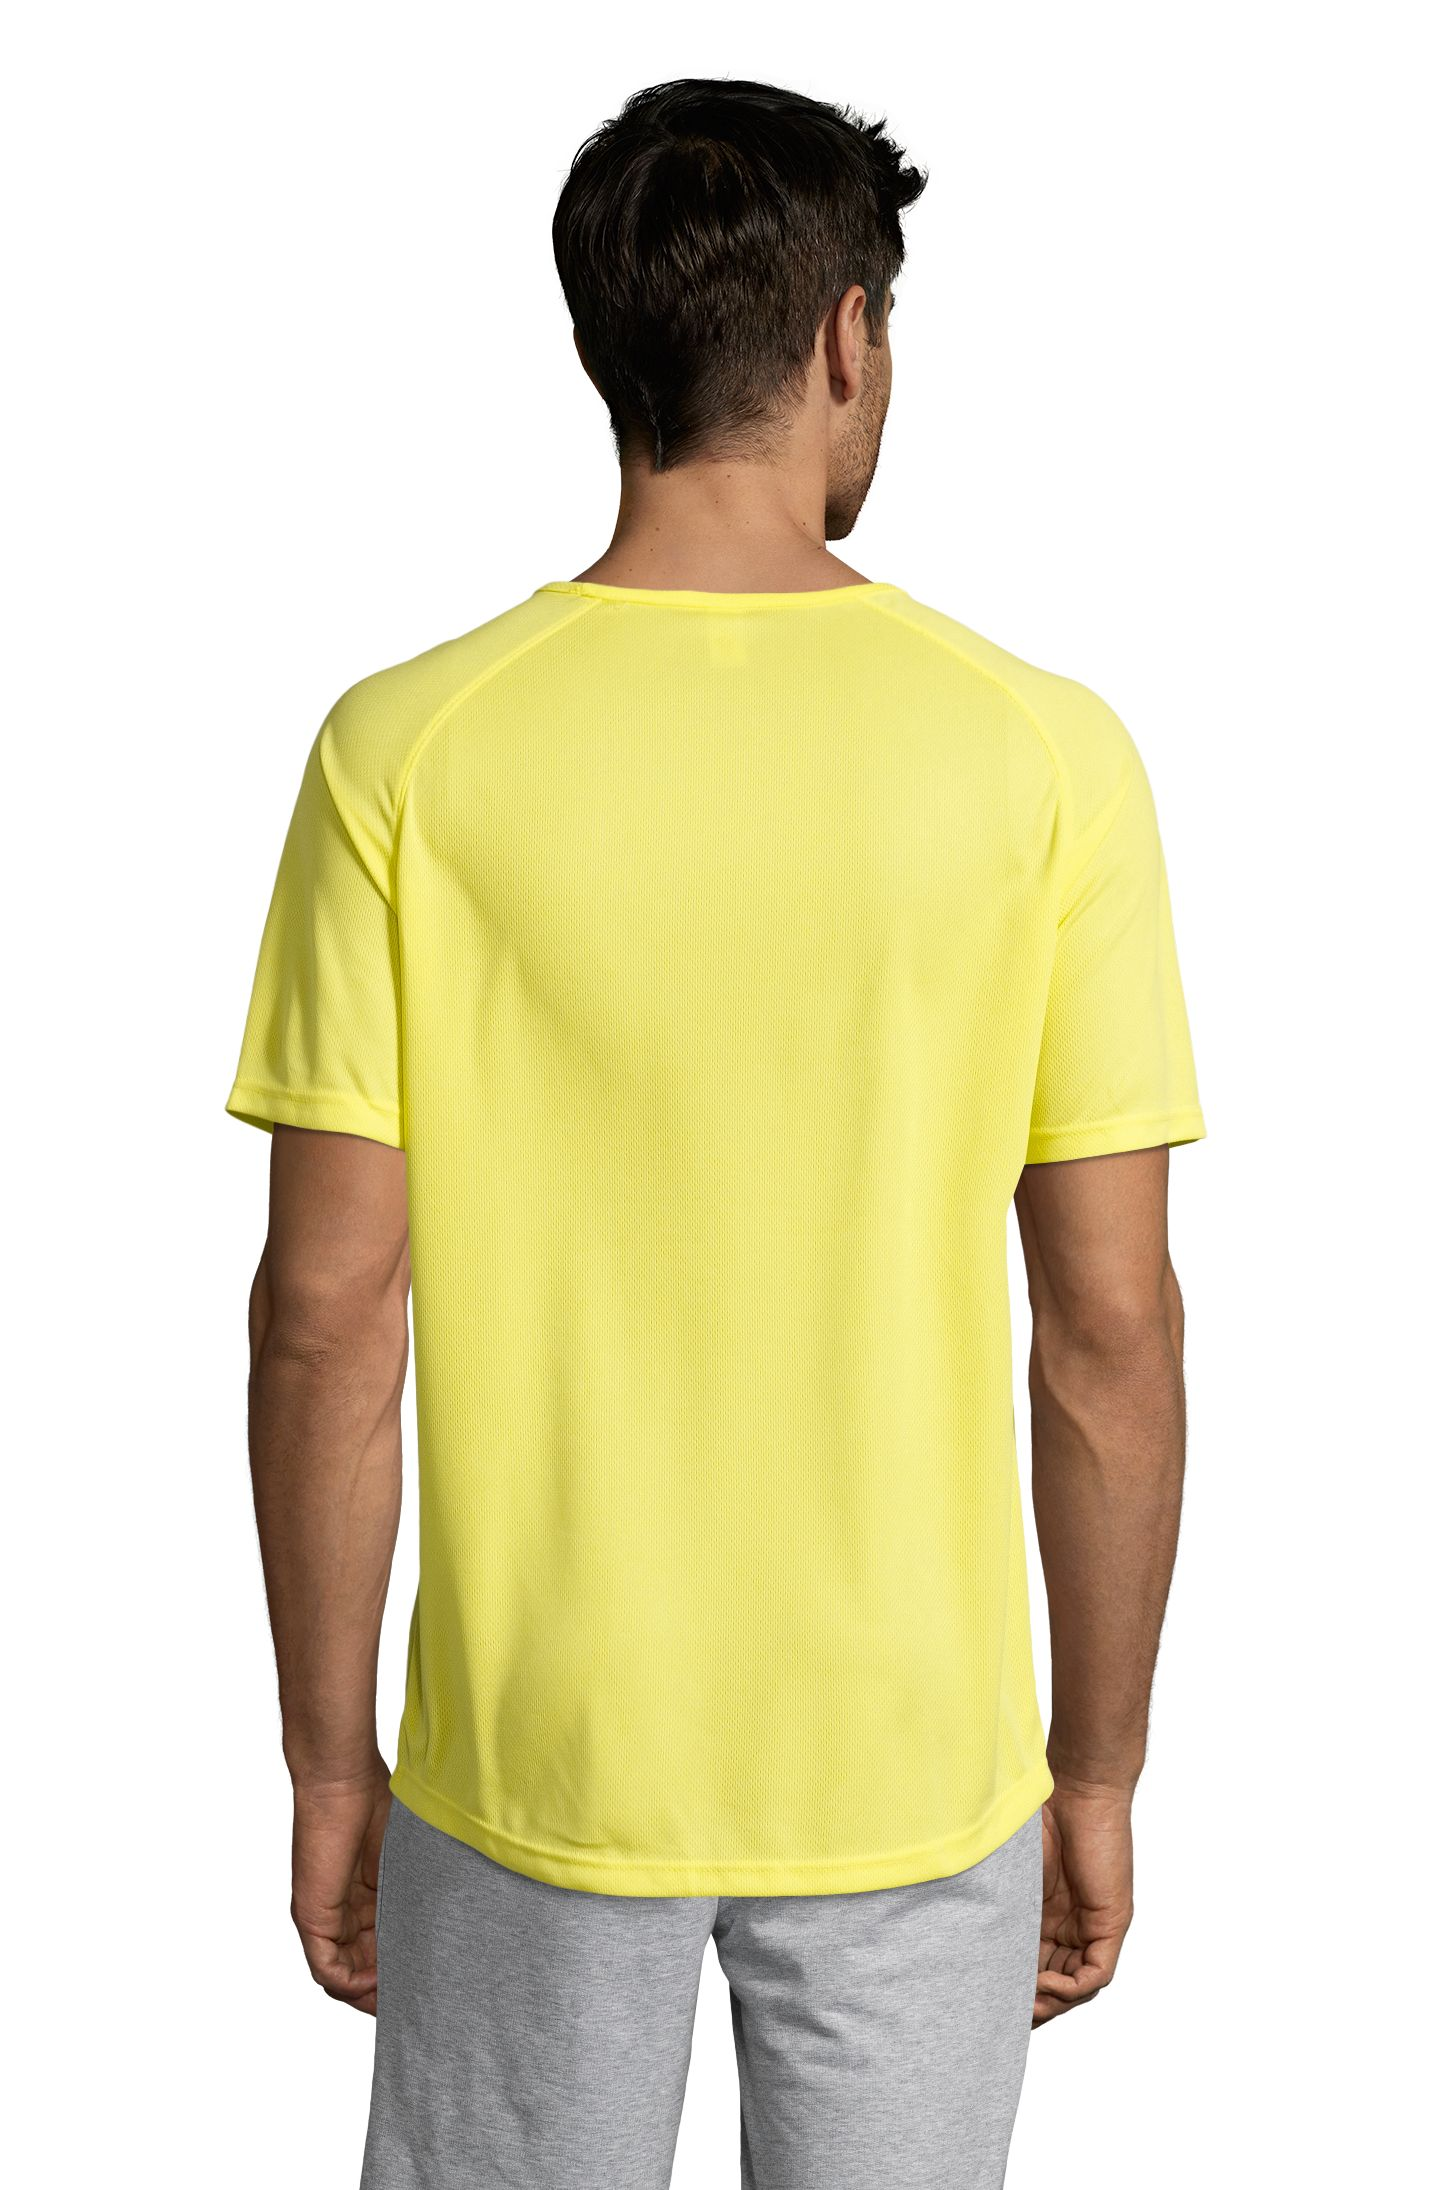 302 - Lemon